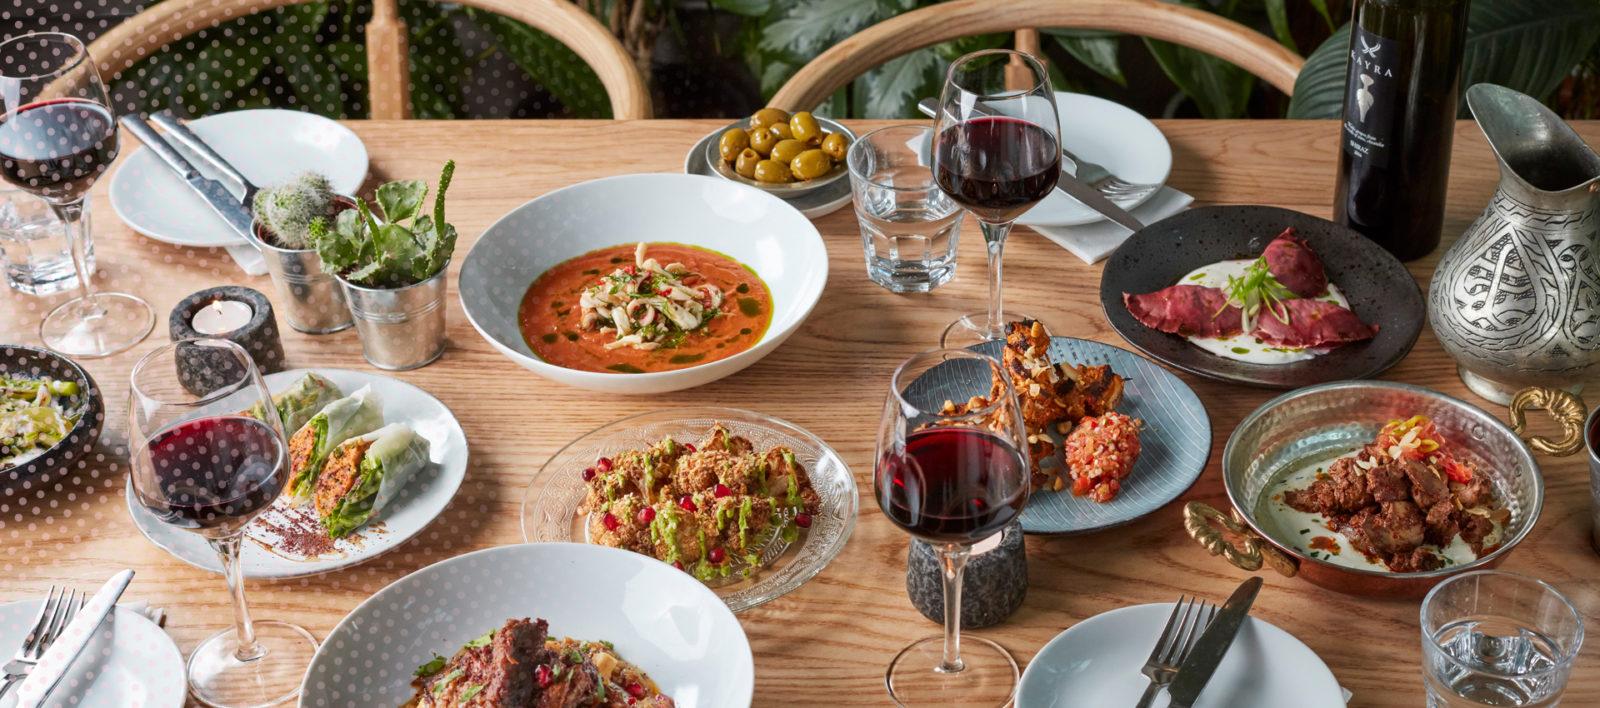 This Is Amber | Amber Restaurant Café | Café In Aldgate East